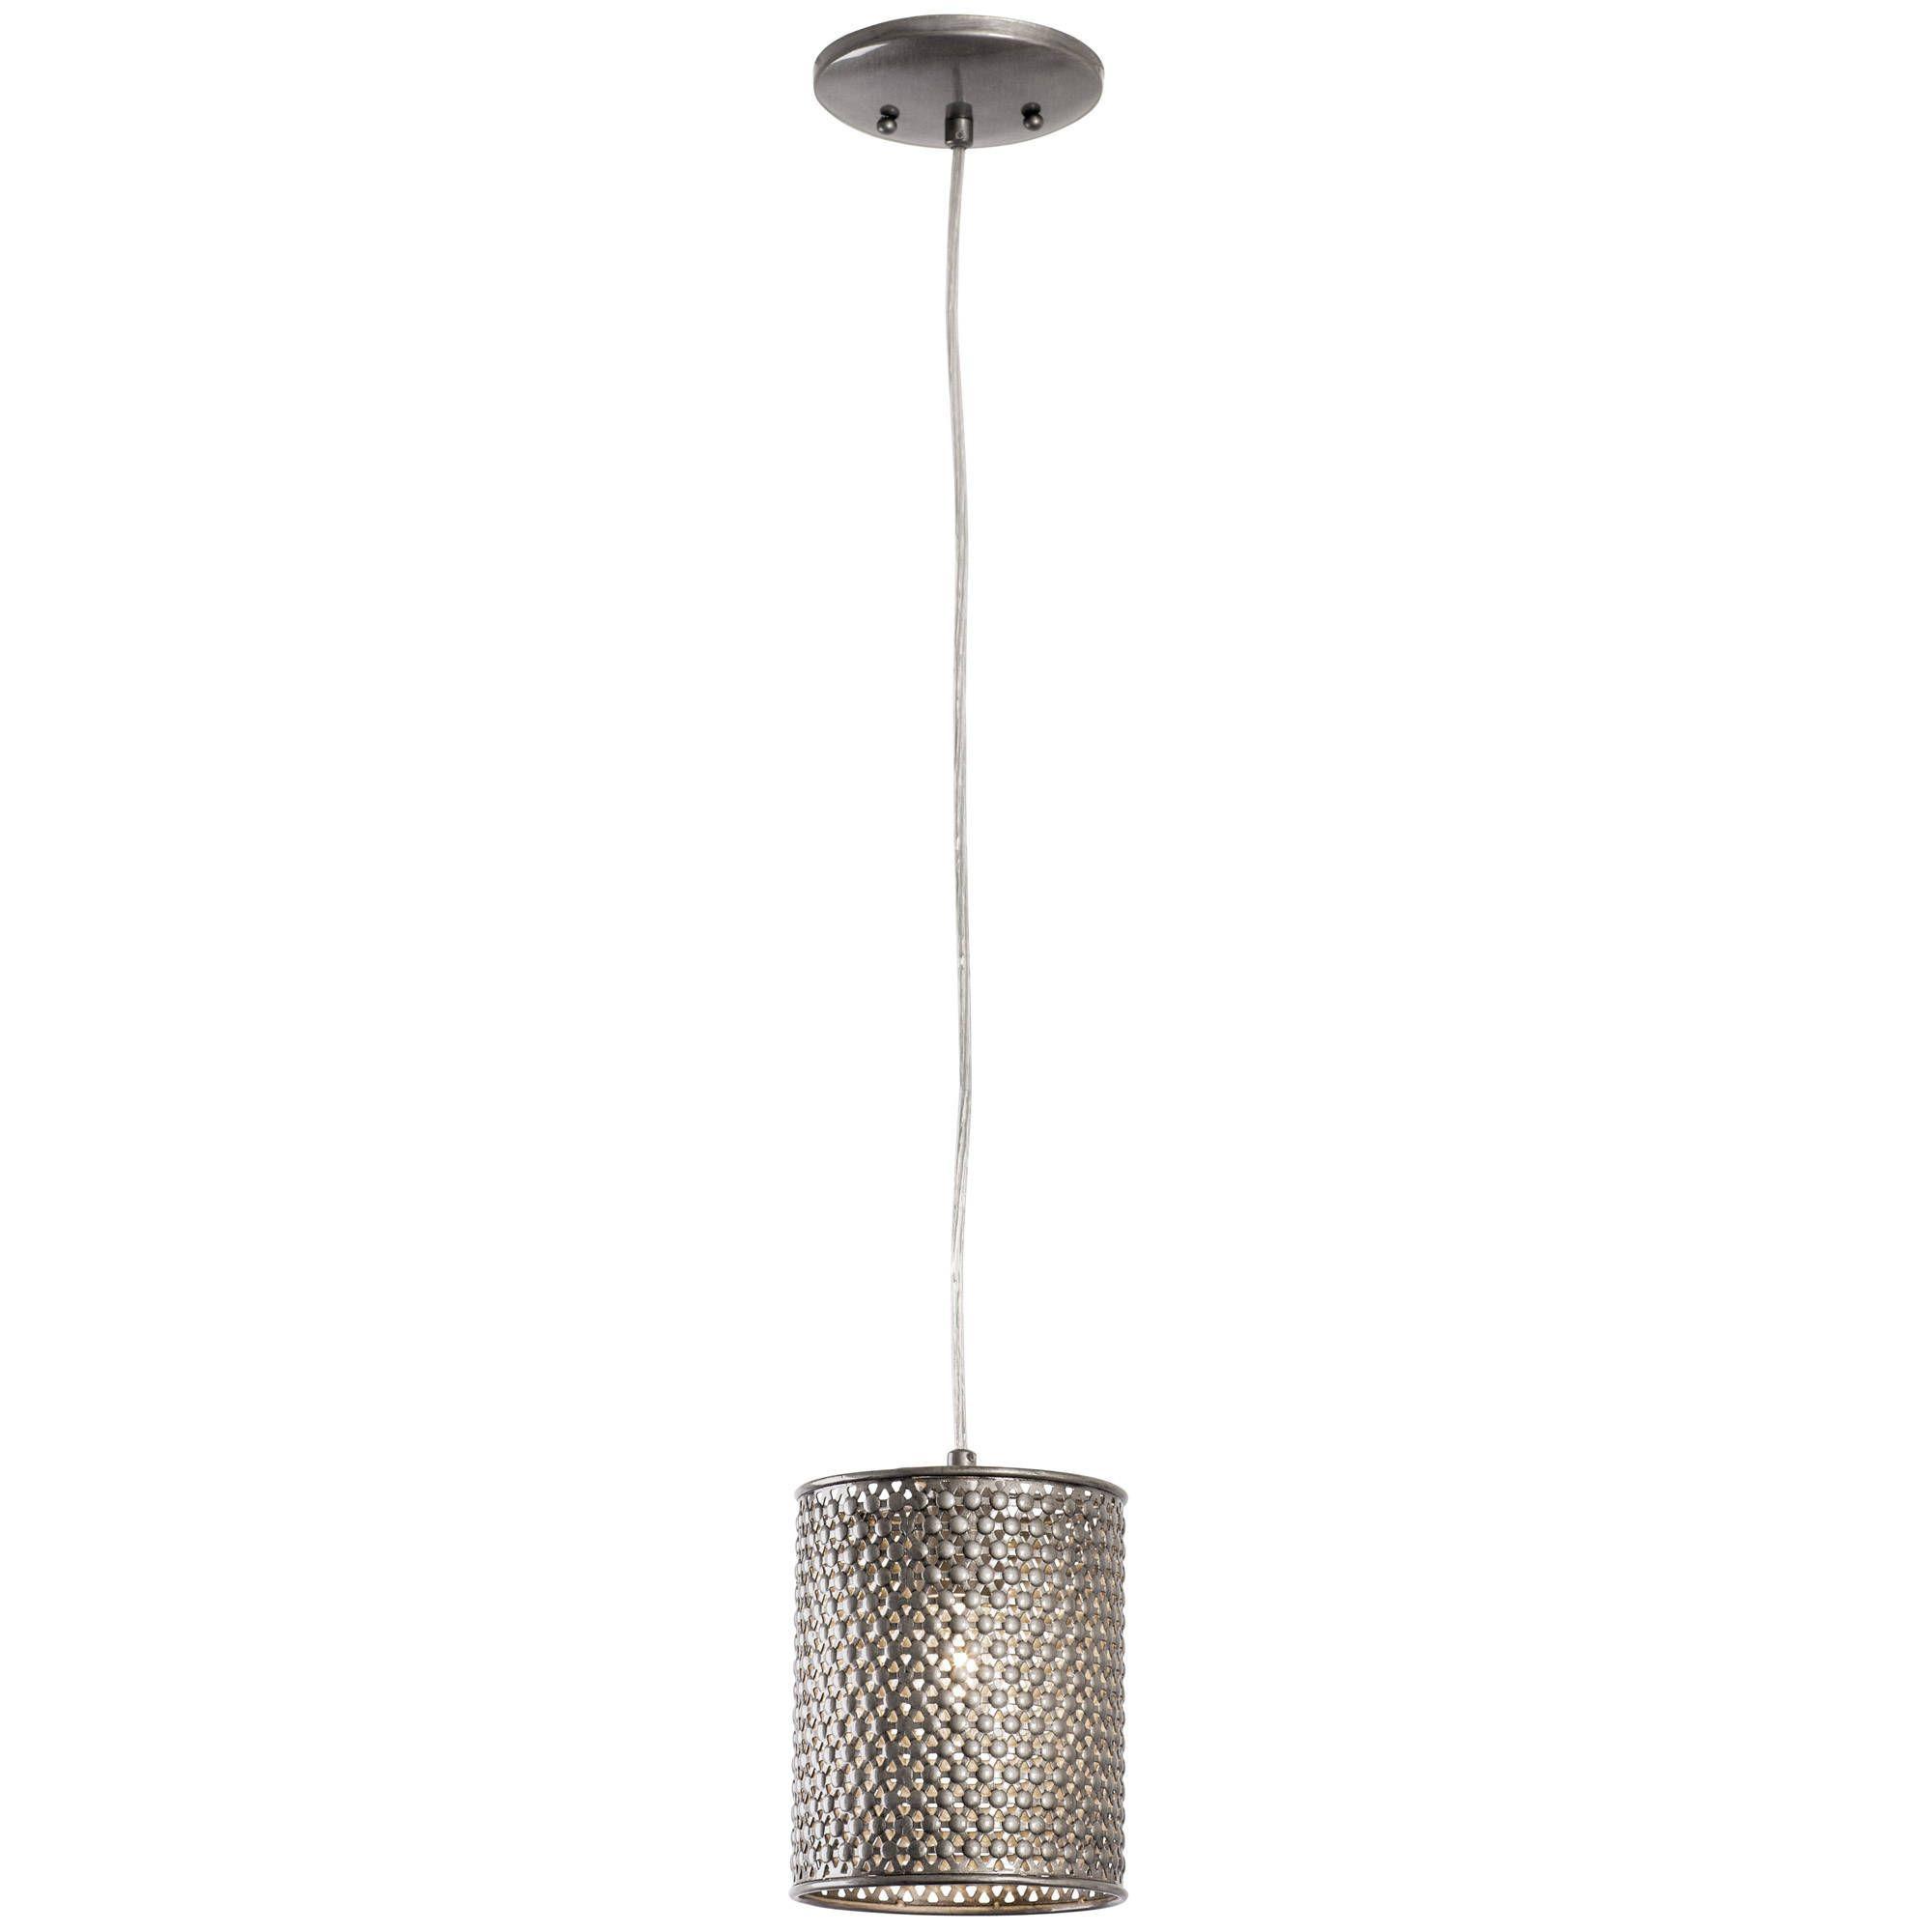 Varaluz casablanca light steel mini pendant steel silver metal